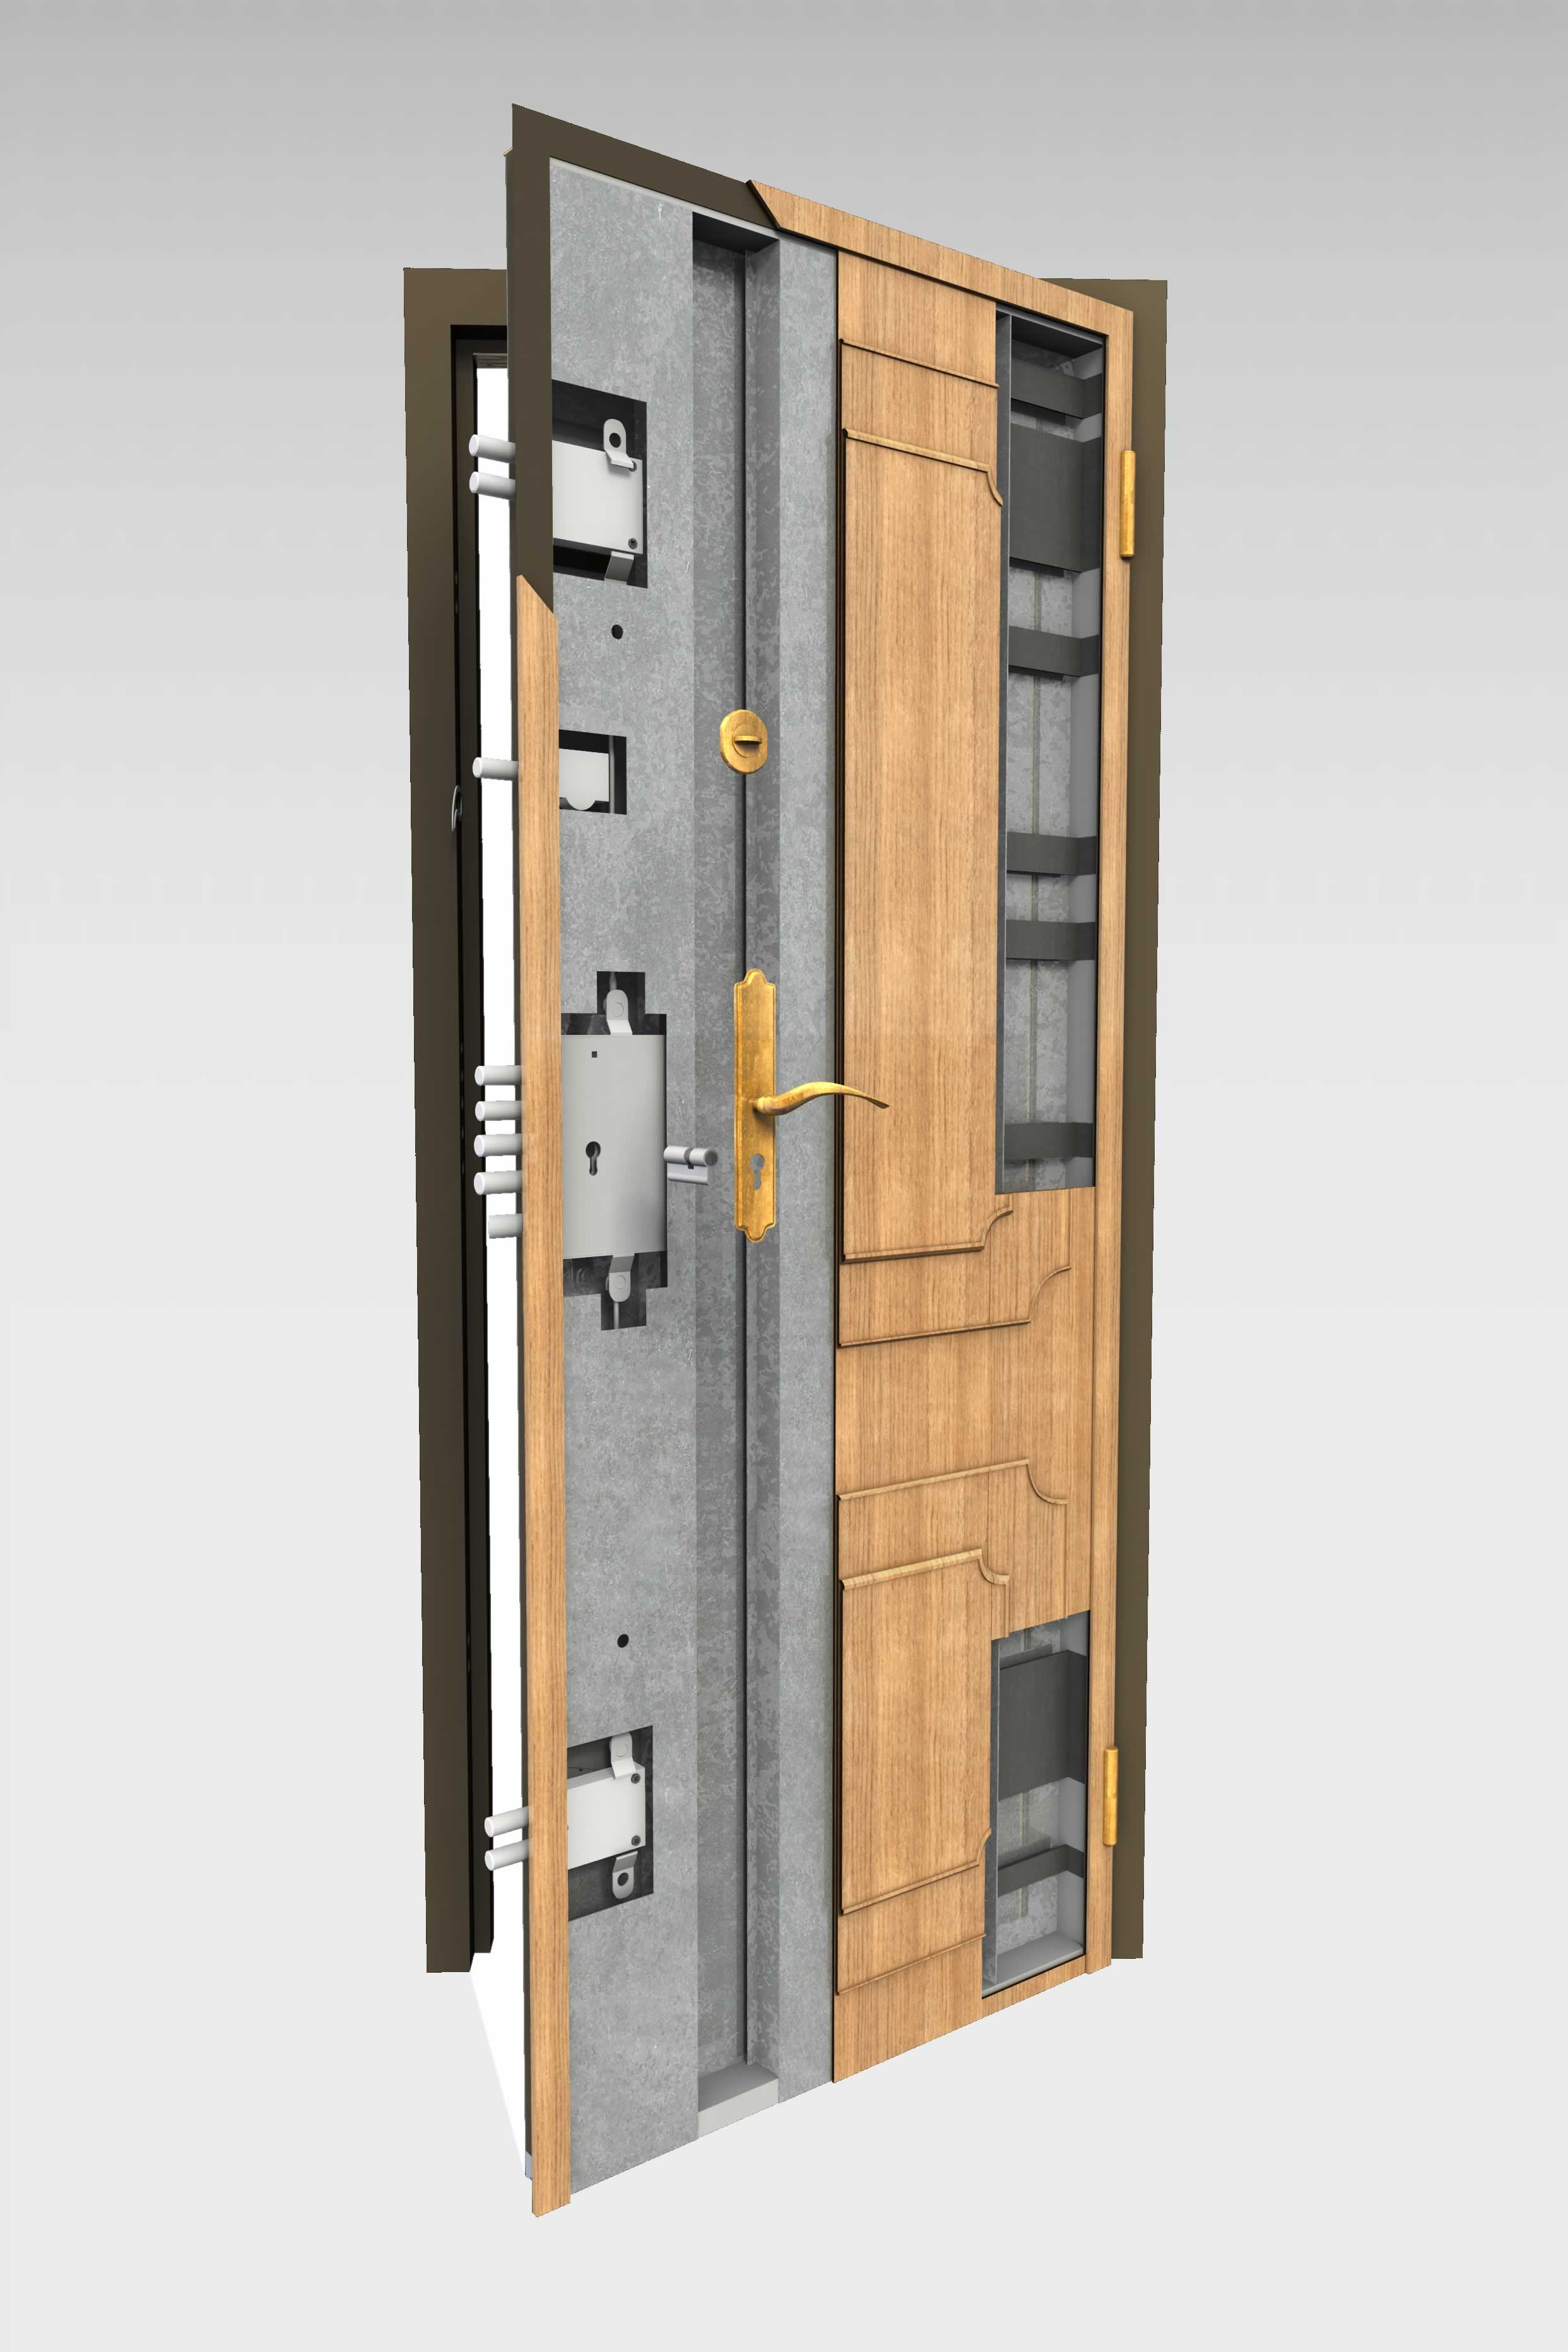 Puerta acorazada 200 ei2 60mn roconsa - Puertas blindadas de exterior ...